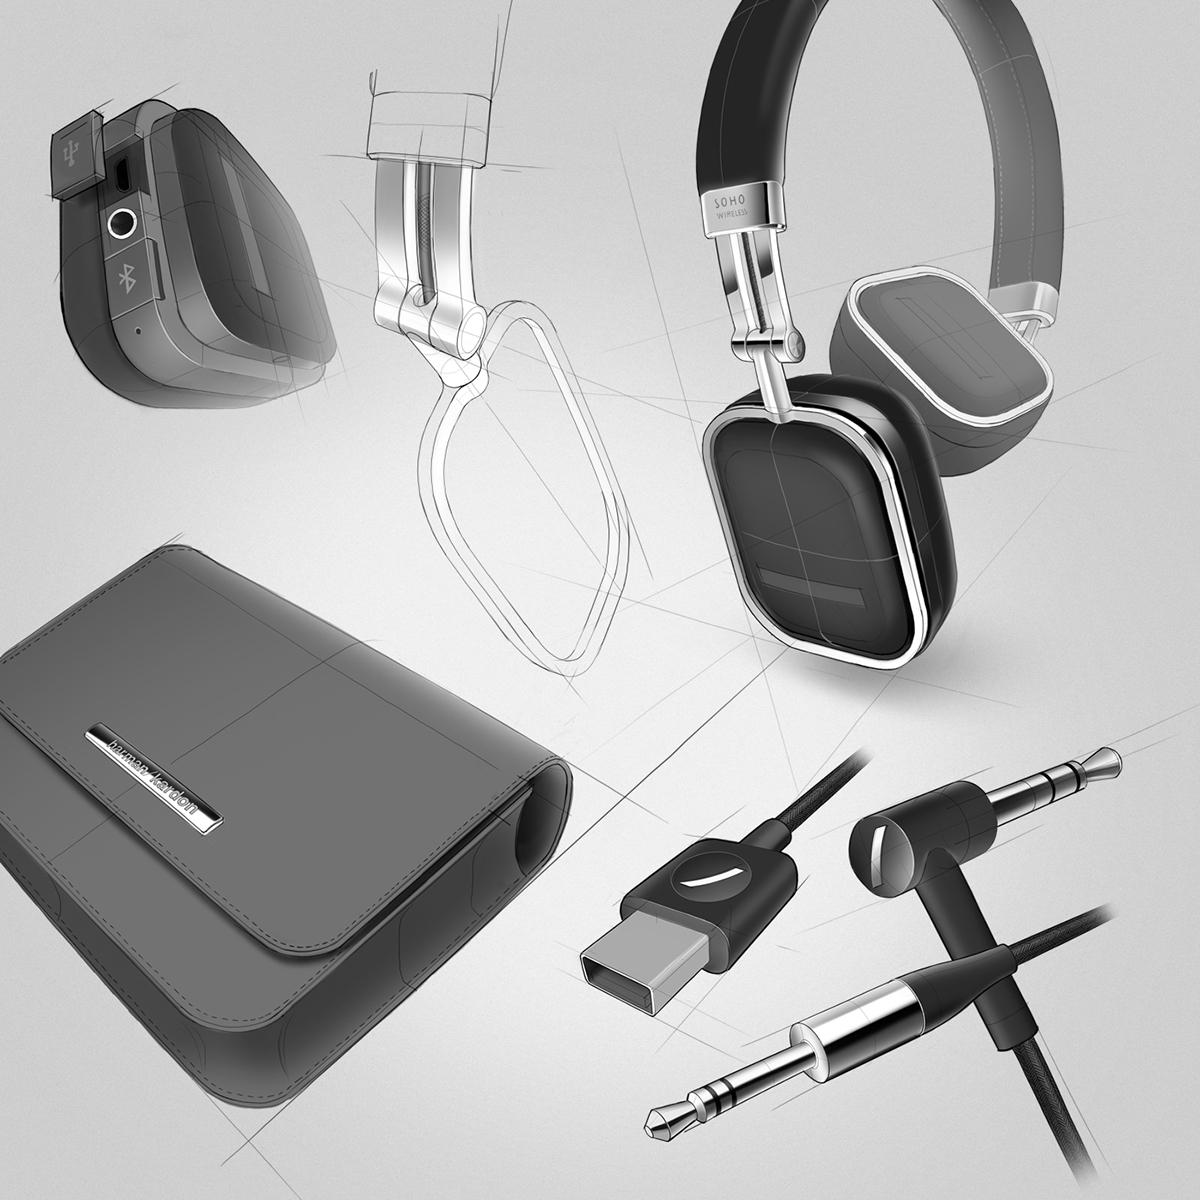 时尚Harman Kardon Soho无线耳机设计